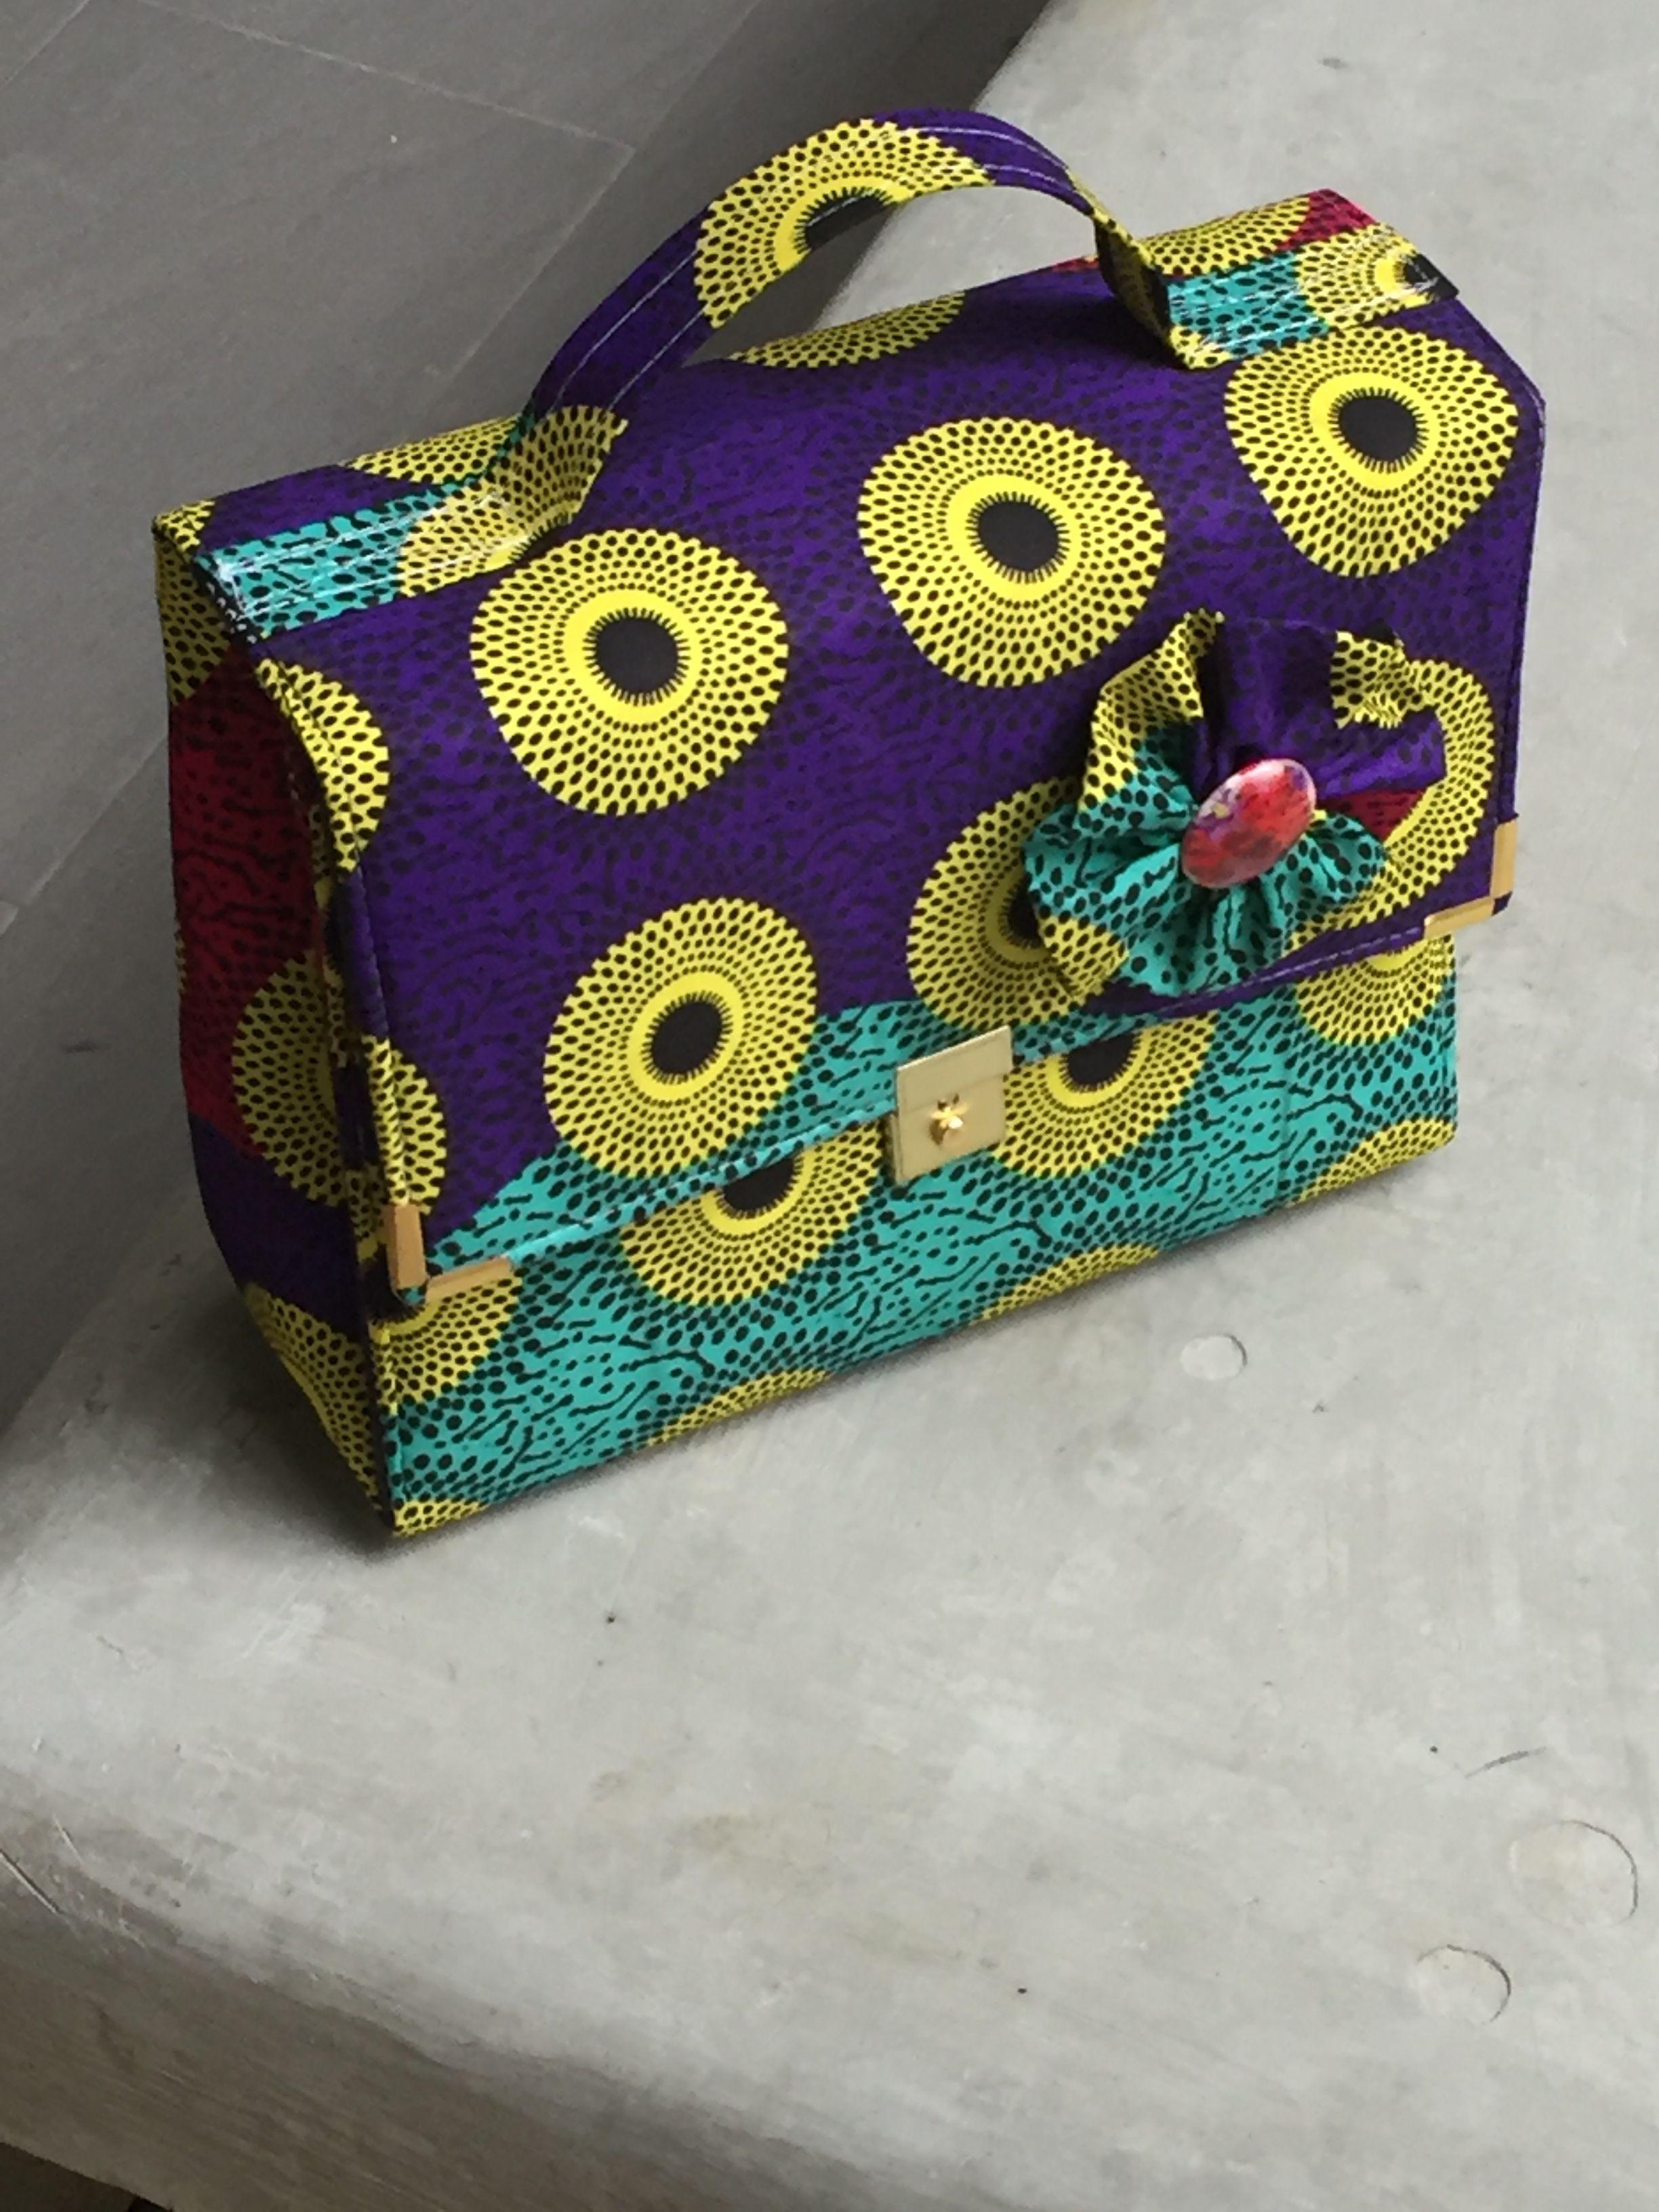 addd55adff Black Beauty Ankara Box Bag   Products   Bags, Tops, Box bag